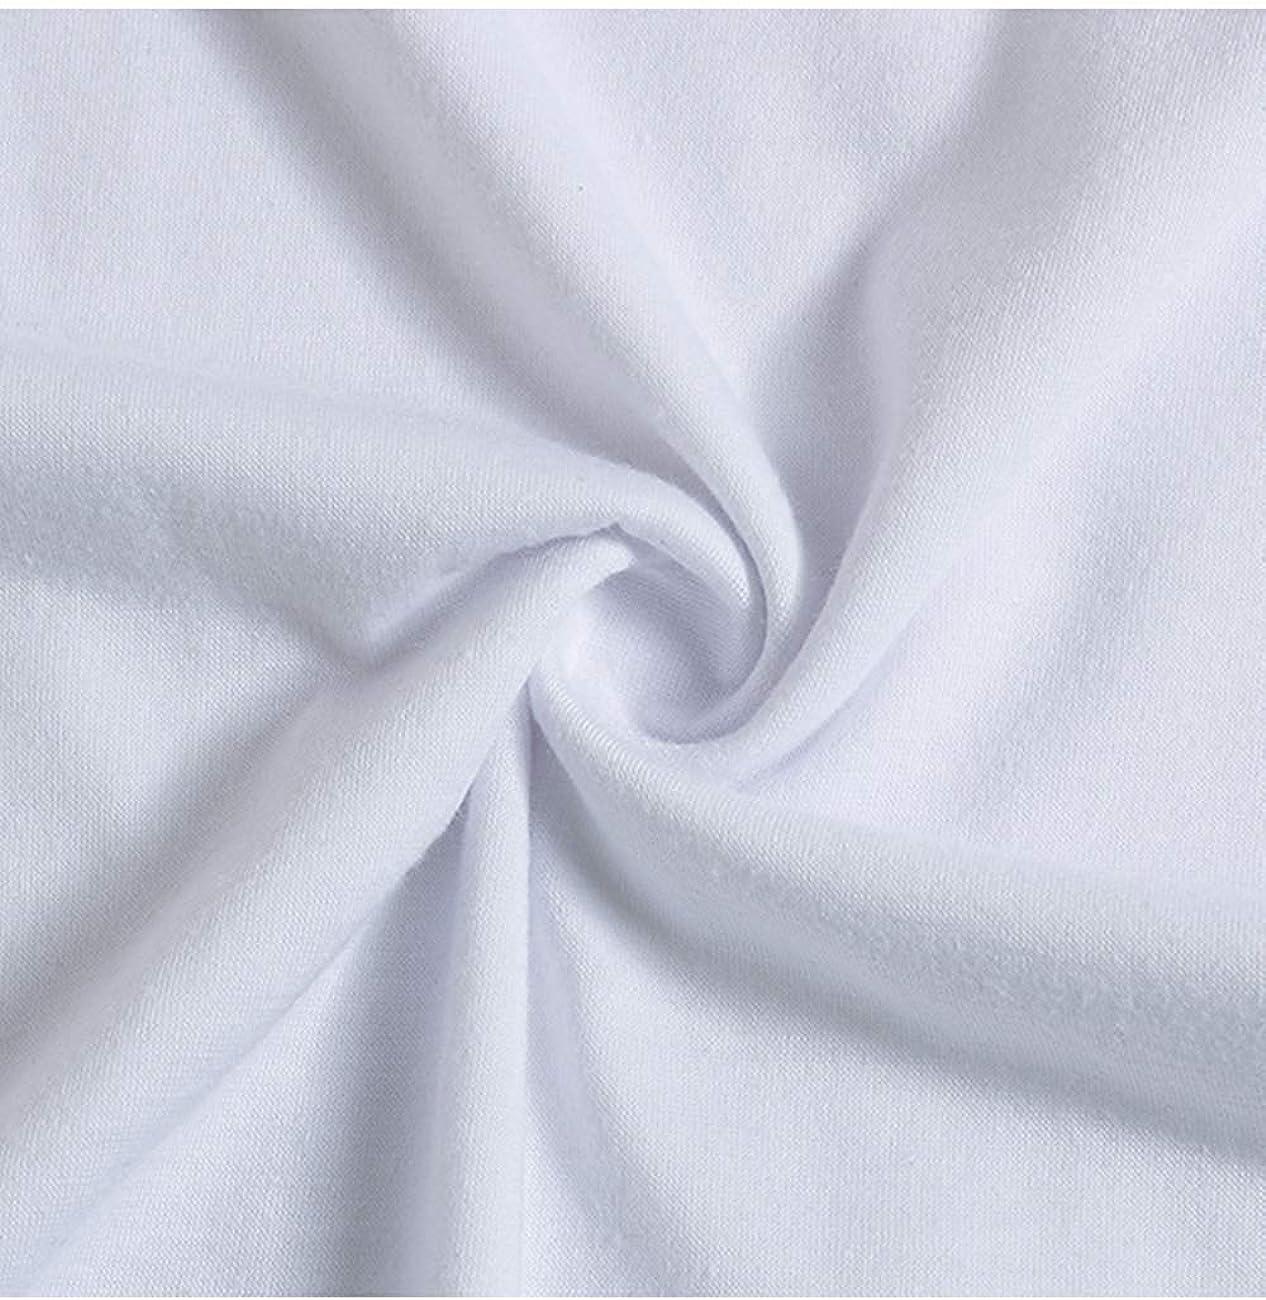 Damen Umstandsmode T Shirt Kurzarm Polyester Weihnachten Elegante Schwangere Casual Blusen Schwangerschaft Lustig Tops P012 Ystwh